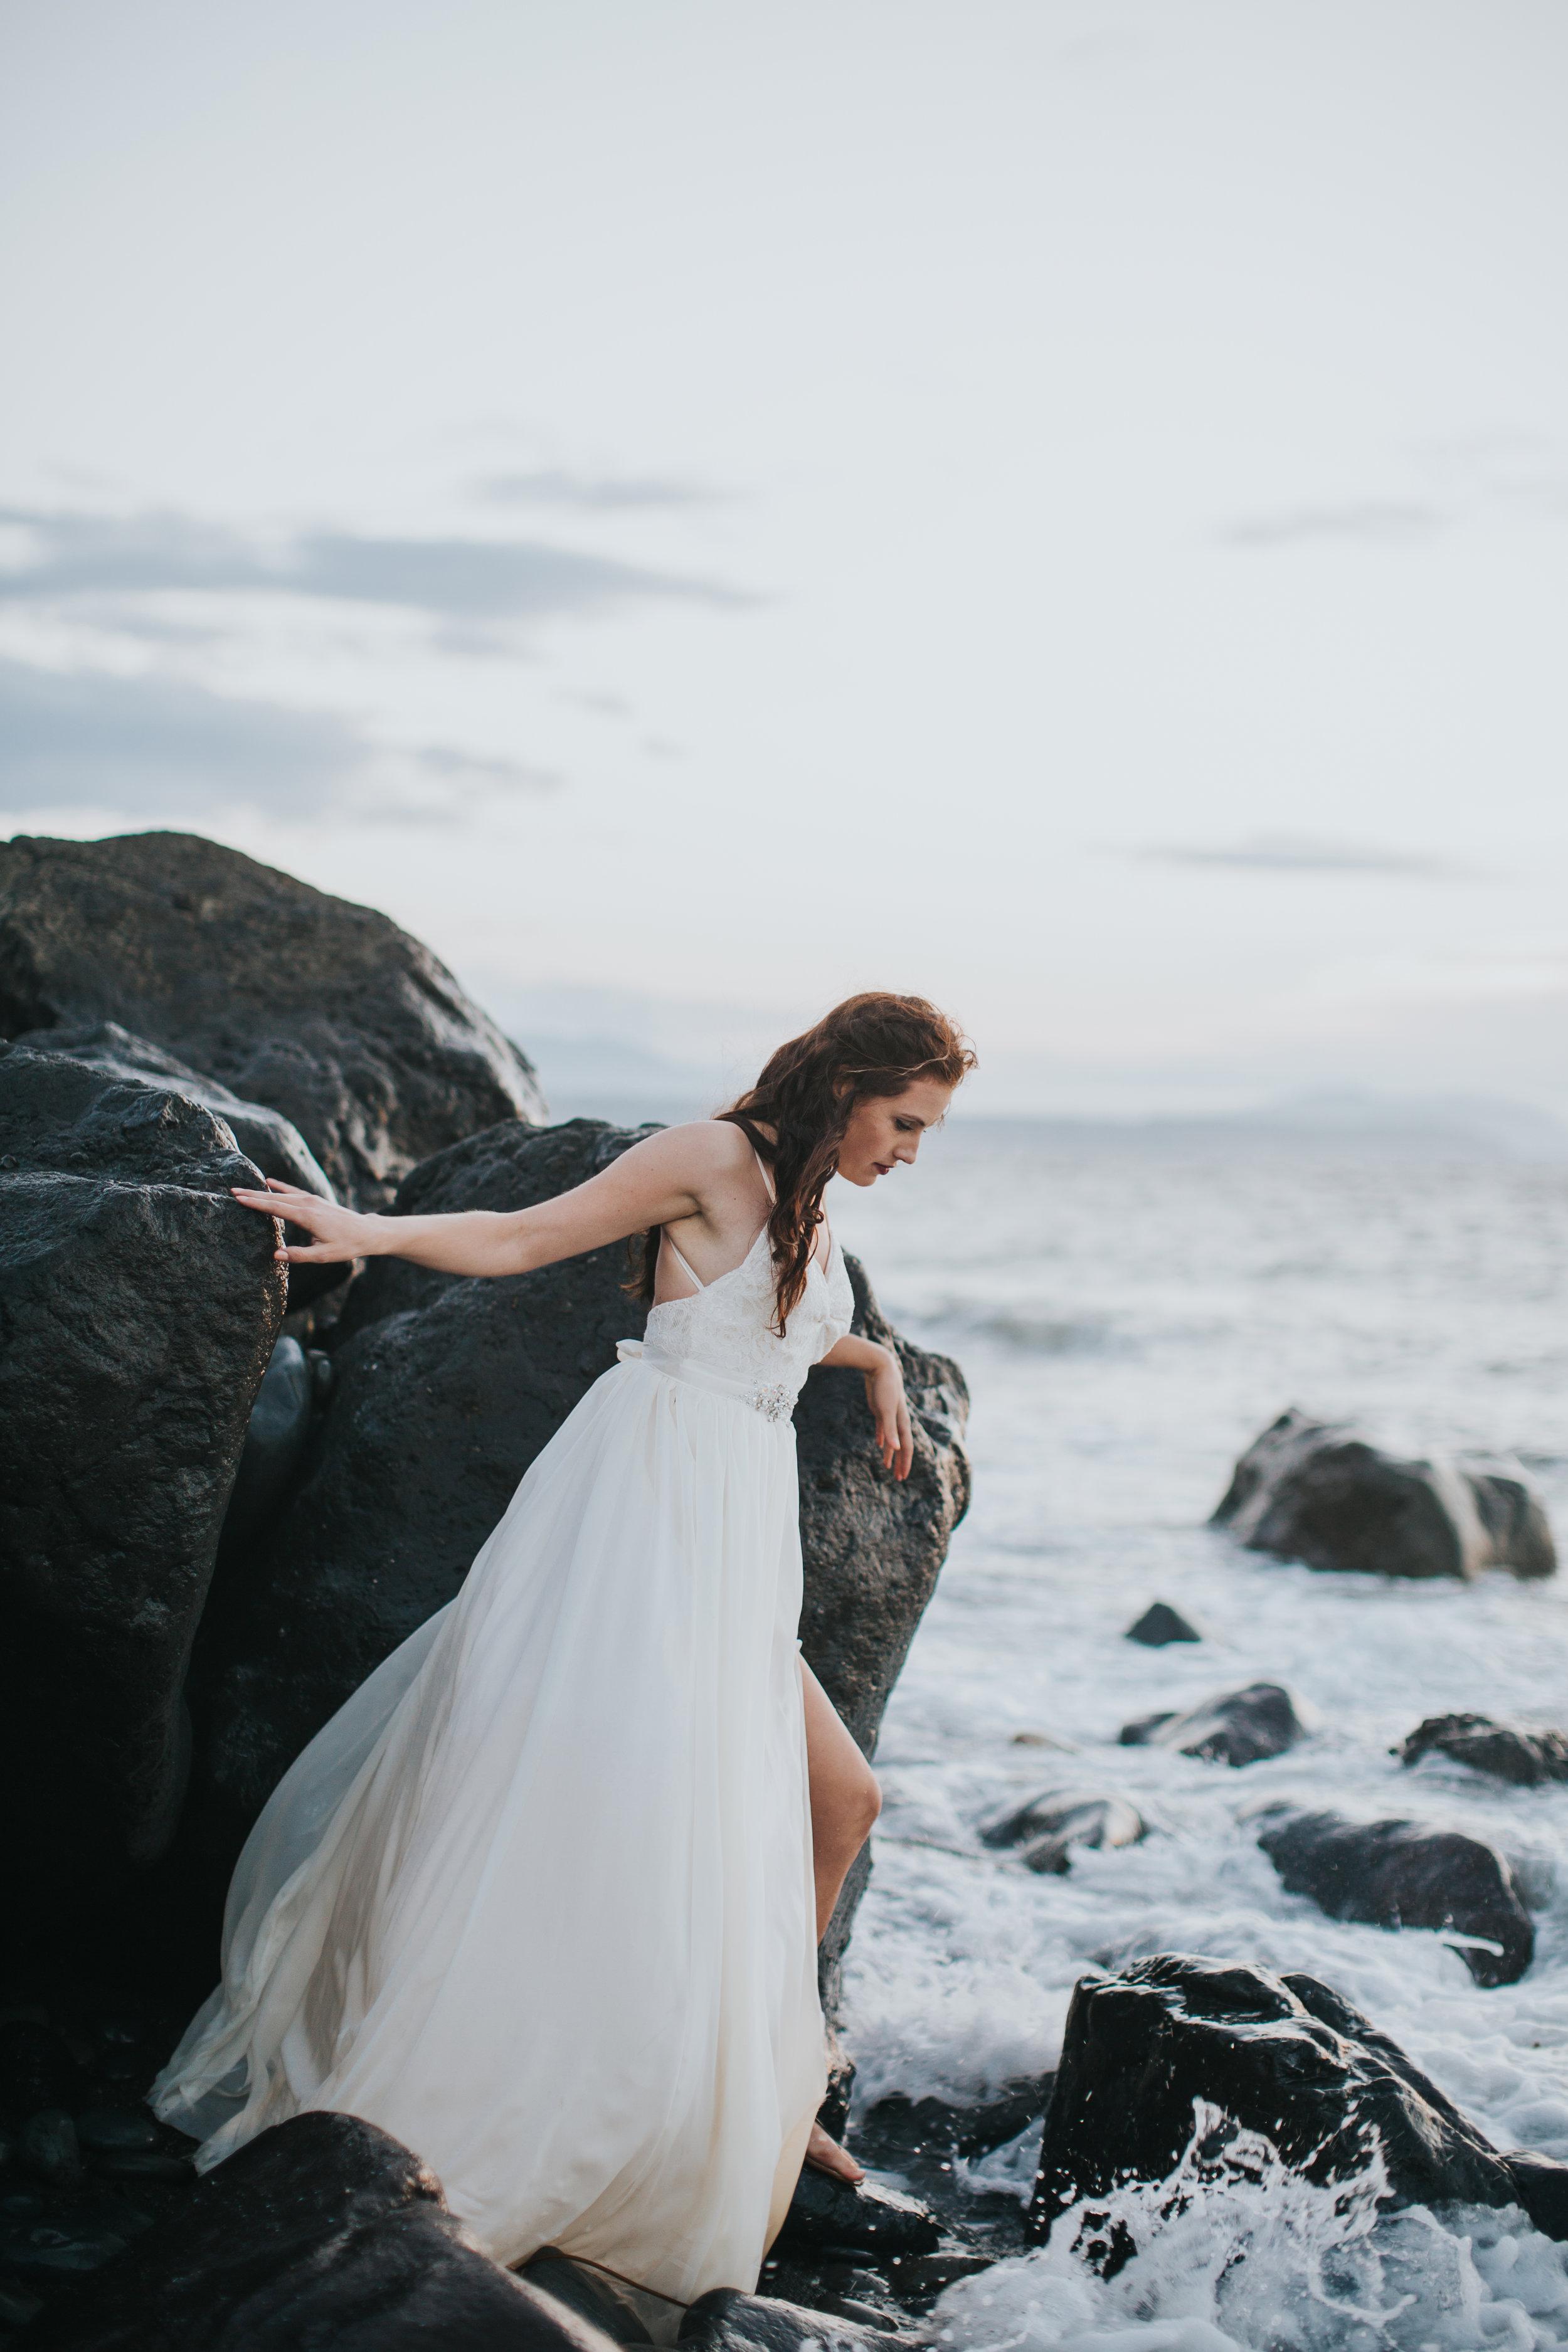 Port-Angeles-Photographer-Olympic-Peninsula-Wedding-Ediz-Hook-bride-dress-Kayla-Dawn-Photography-Olympic-Peninsula-PNW-Photographer-Portrait-Portraiture-Natural-Golden-Hour-Beach (10).jpg